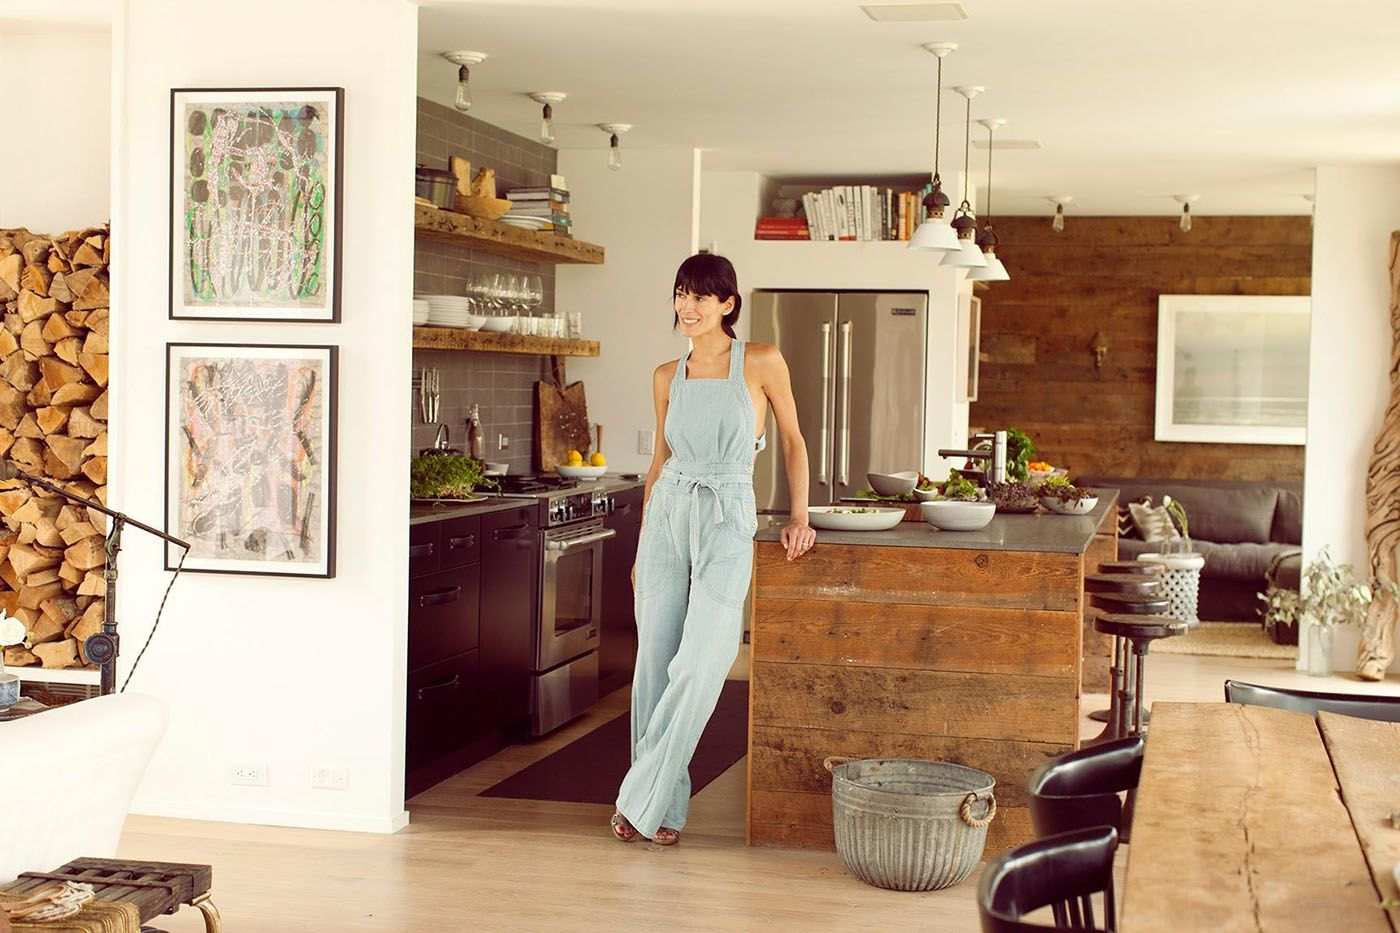 Not Always Easy Does It Eyeswoon Recipe Athena Calderone Eyeswoon Kitchen Design Decor